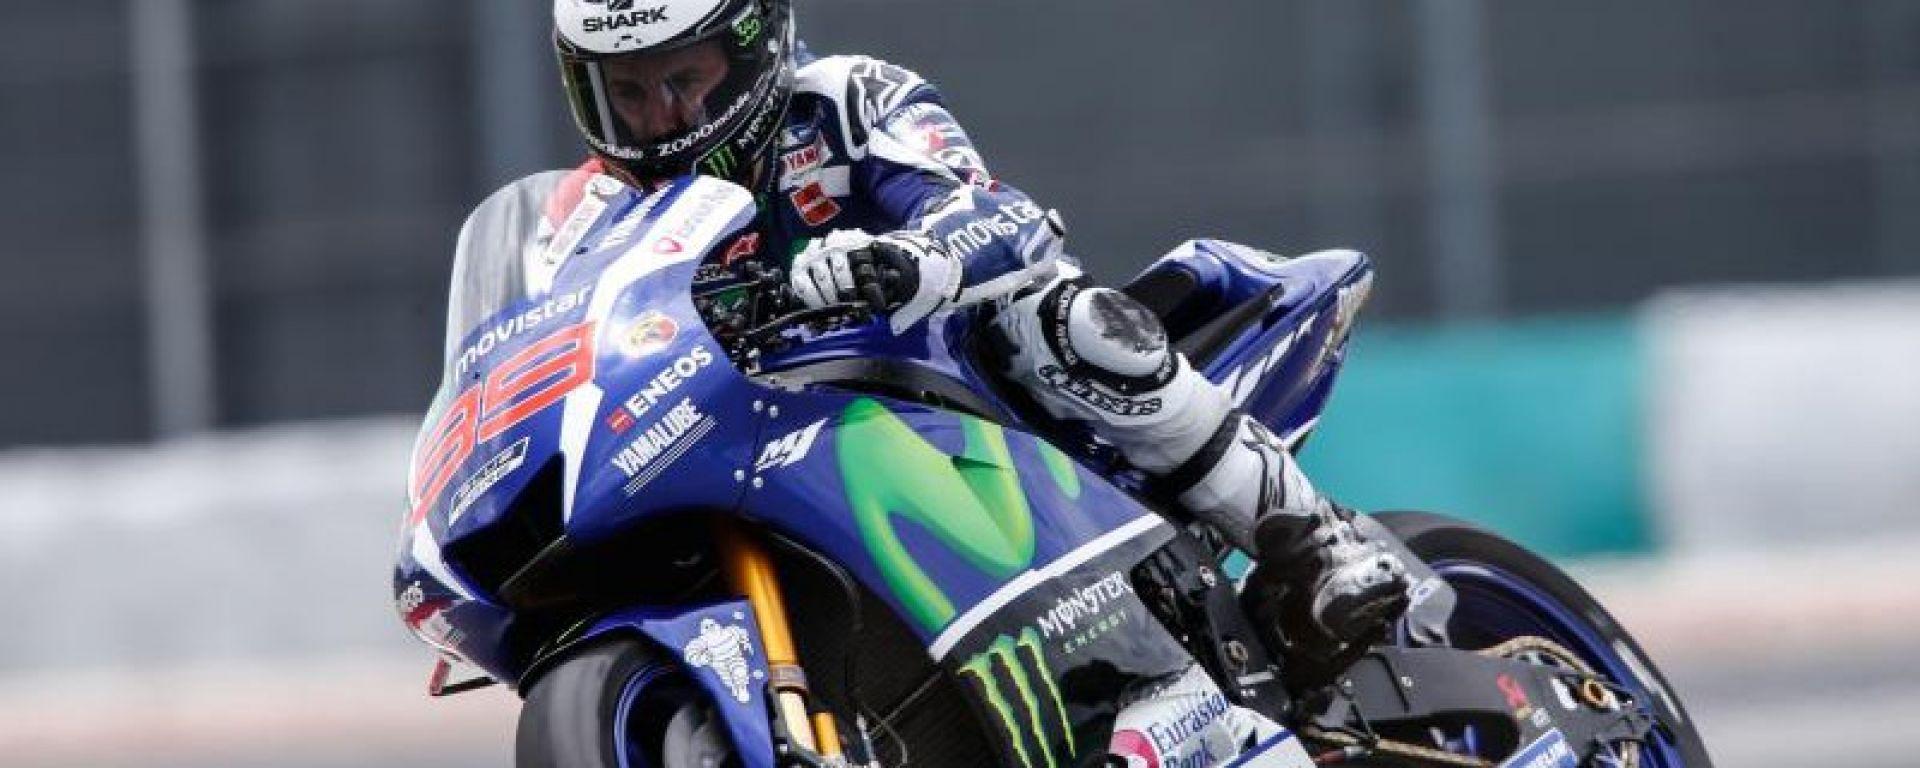 MotoGP 2016: i punti critici emersi dai test di Sepang